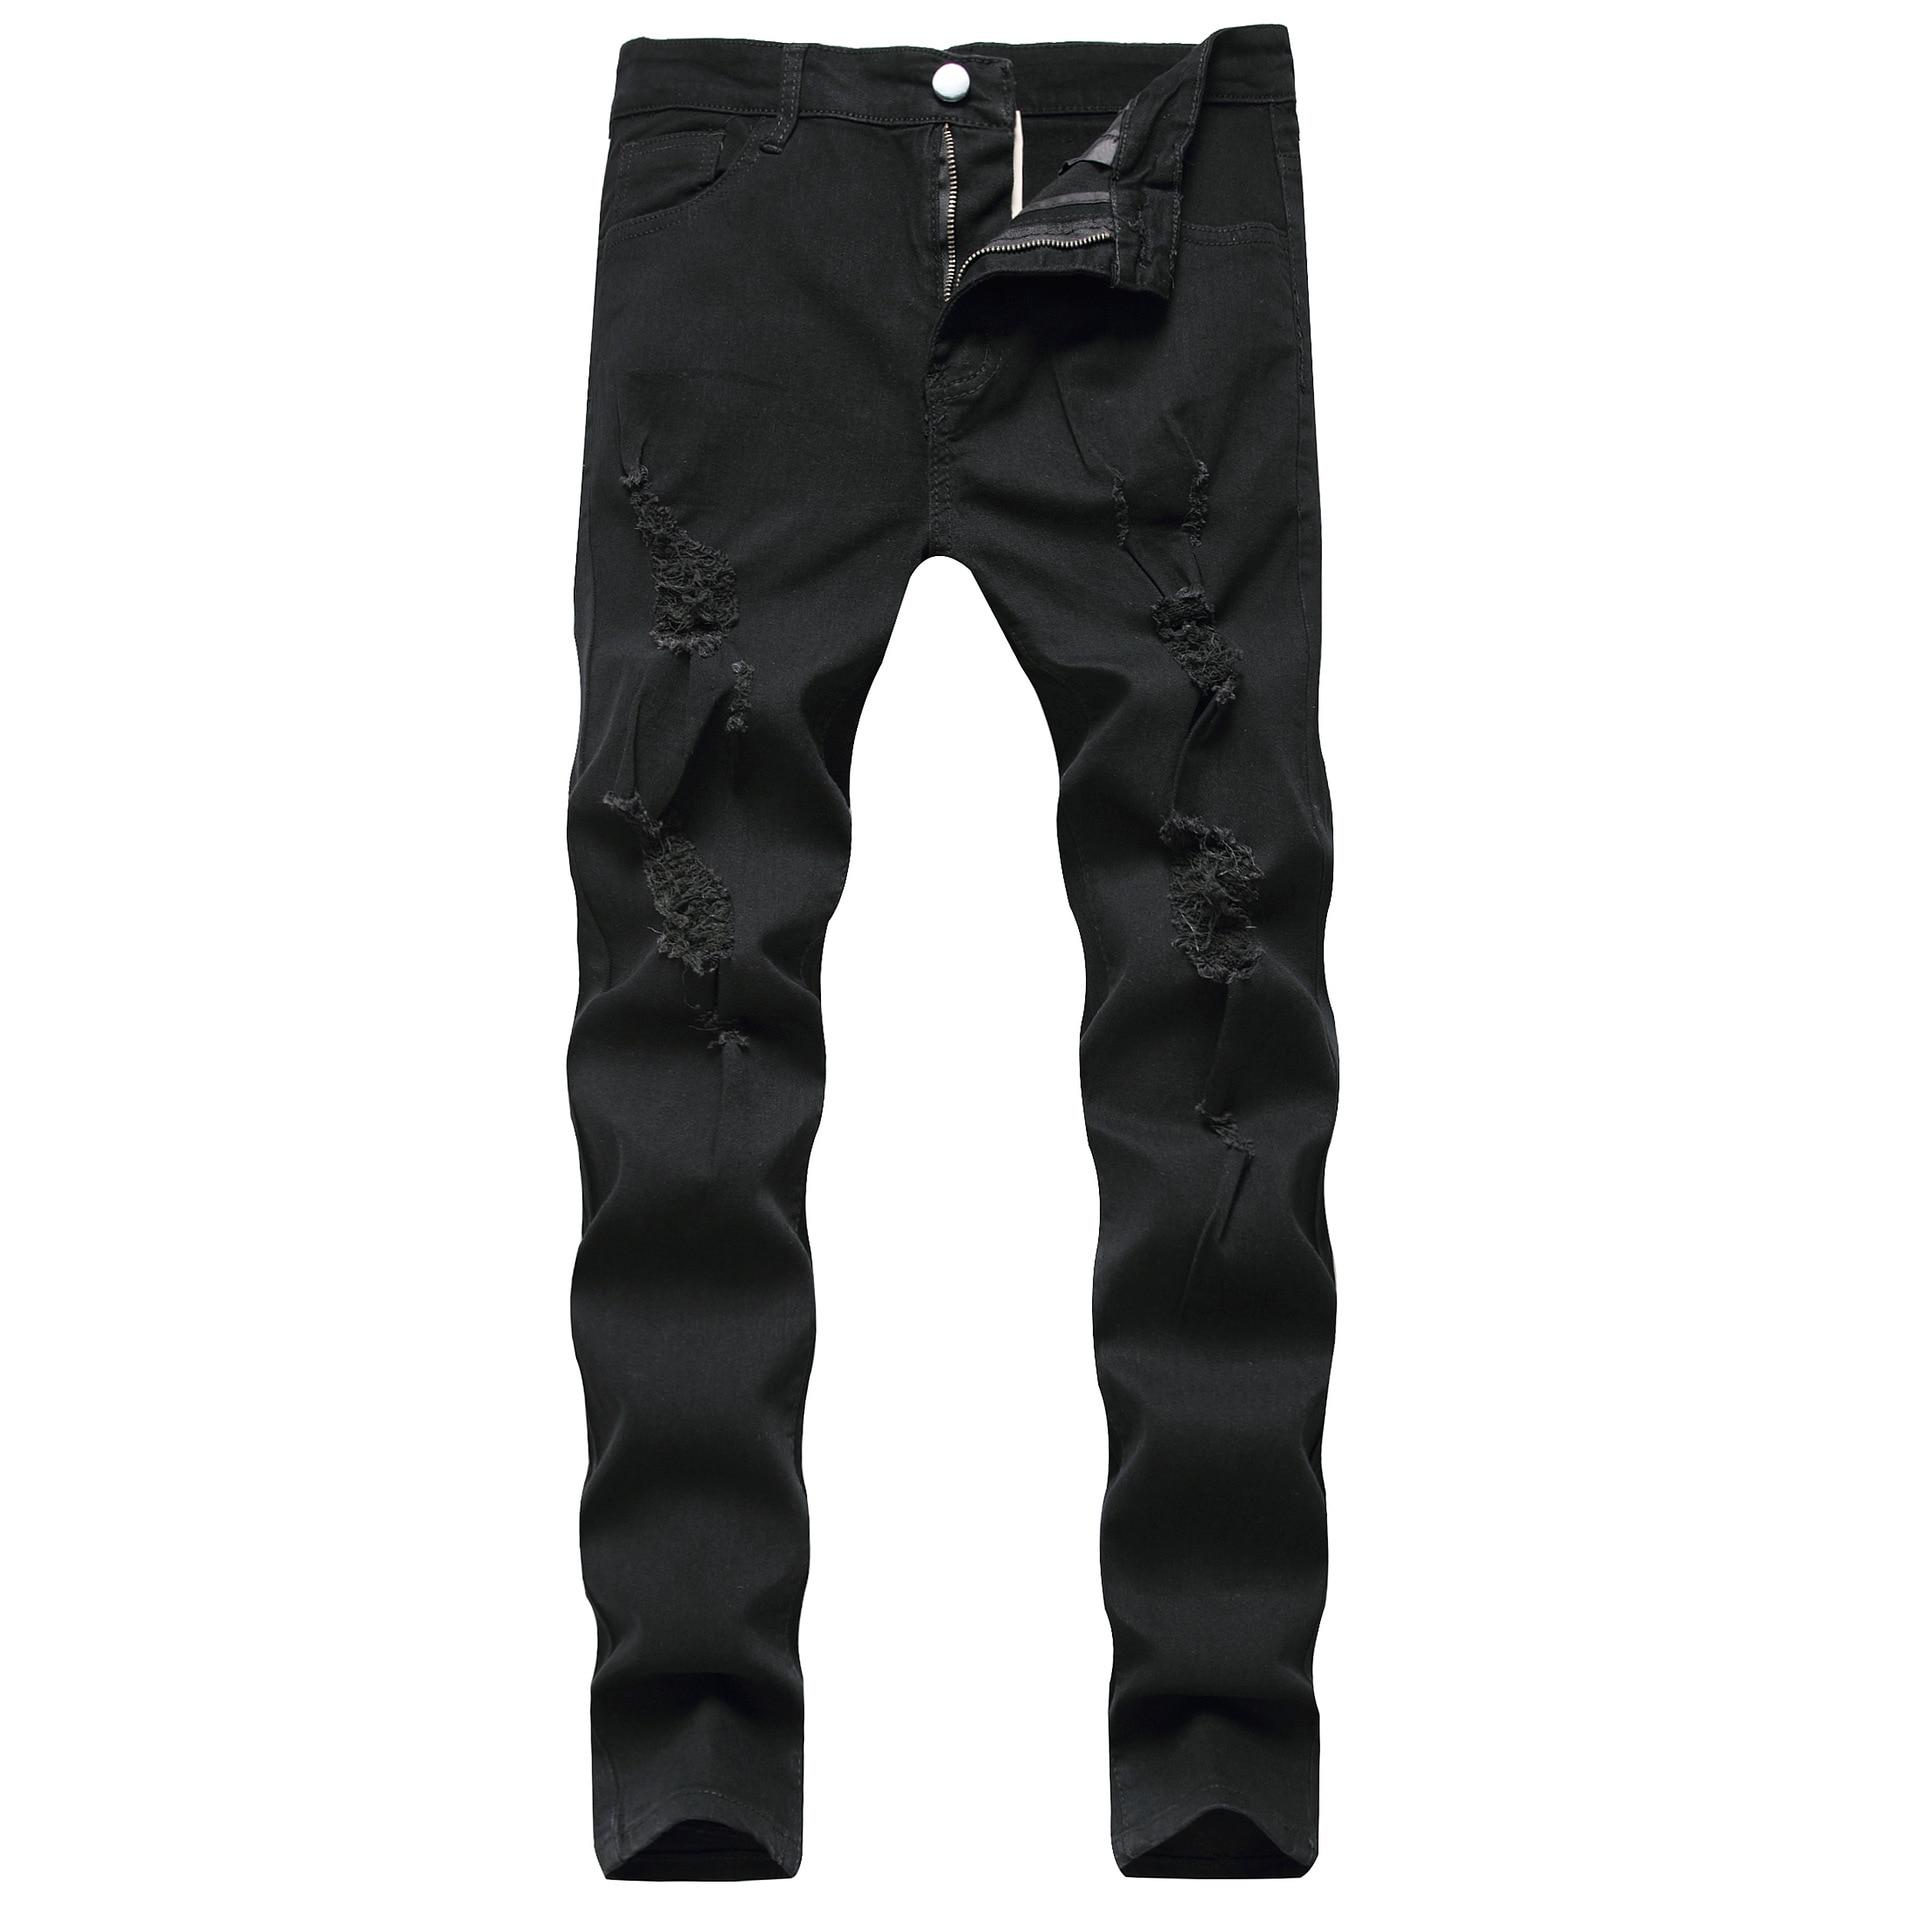 2020 Blue Black White Men's Sweatpants Sexy Hole Jeans Pants Casual Male Ripped Skinny Trousers Slim Biker Outwears Pants